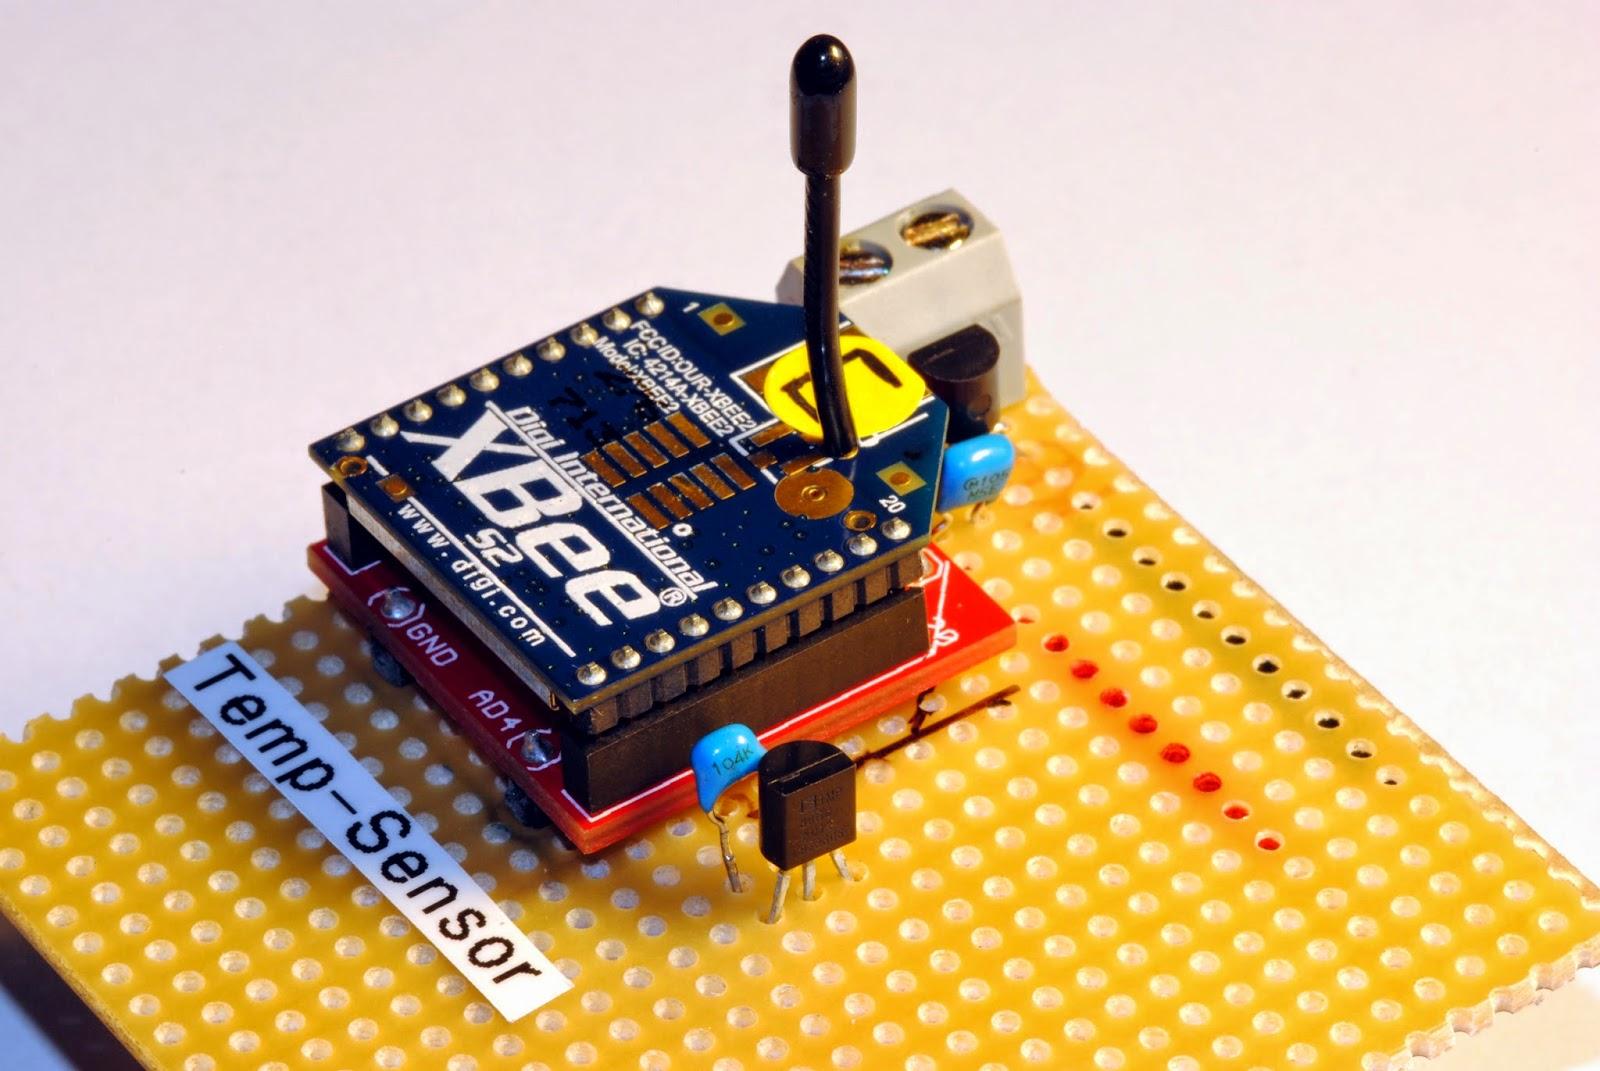 temperature sensor on stripboard [ 1600 x 1071 Pixel ]